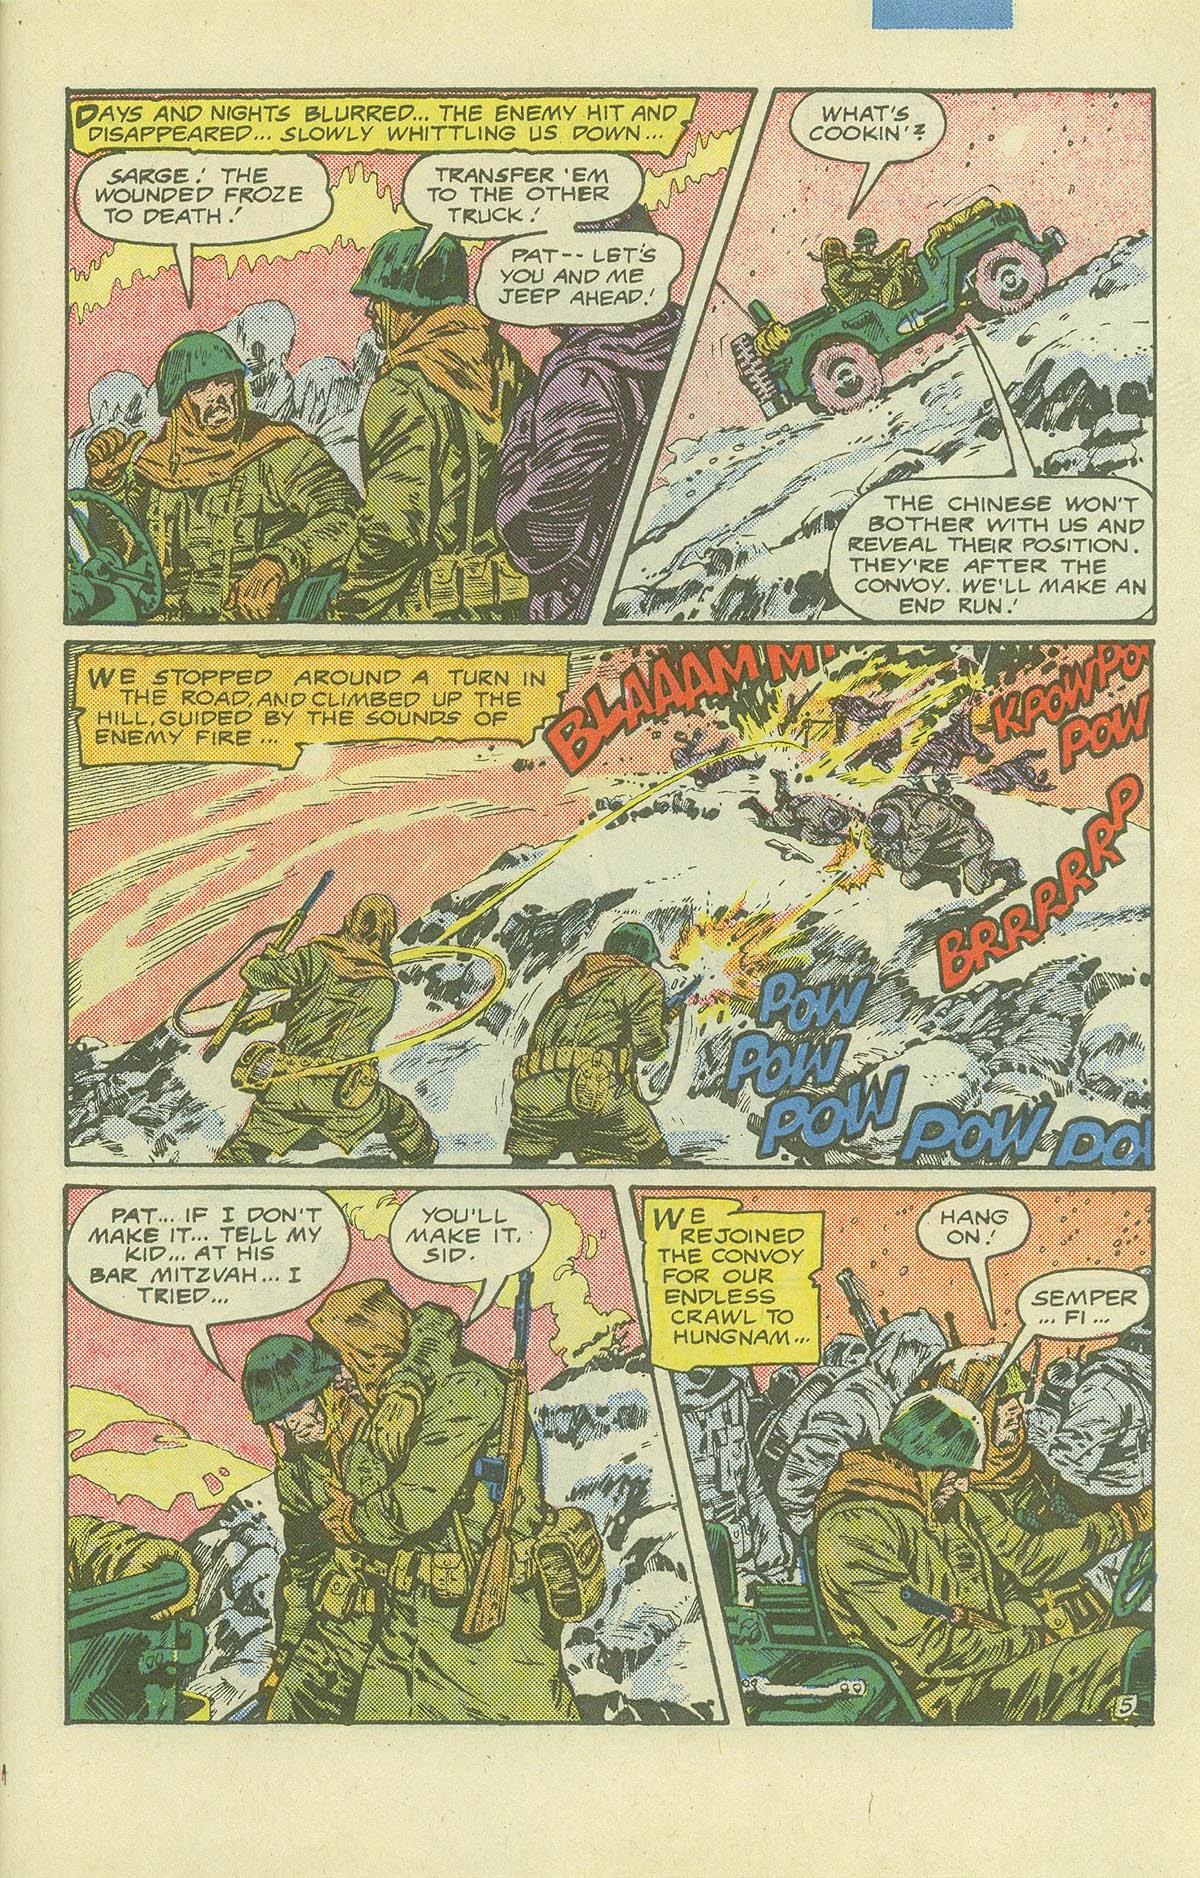 Read online Sgt. Rock comic -  Issue #411 - 30